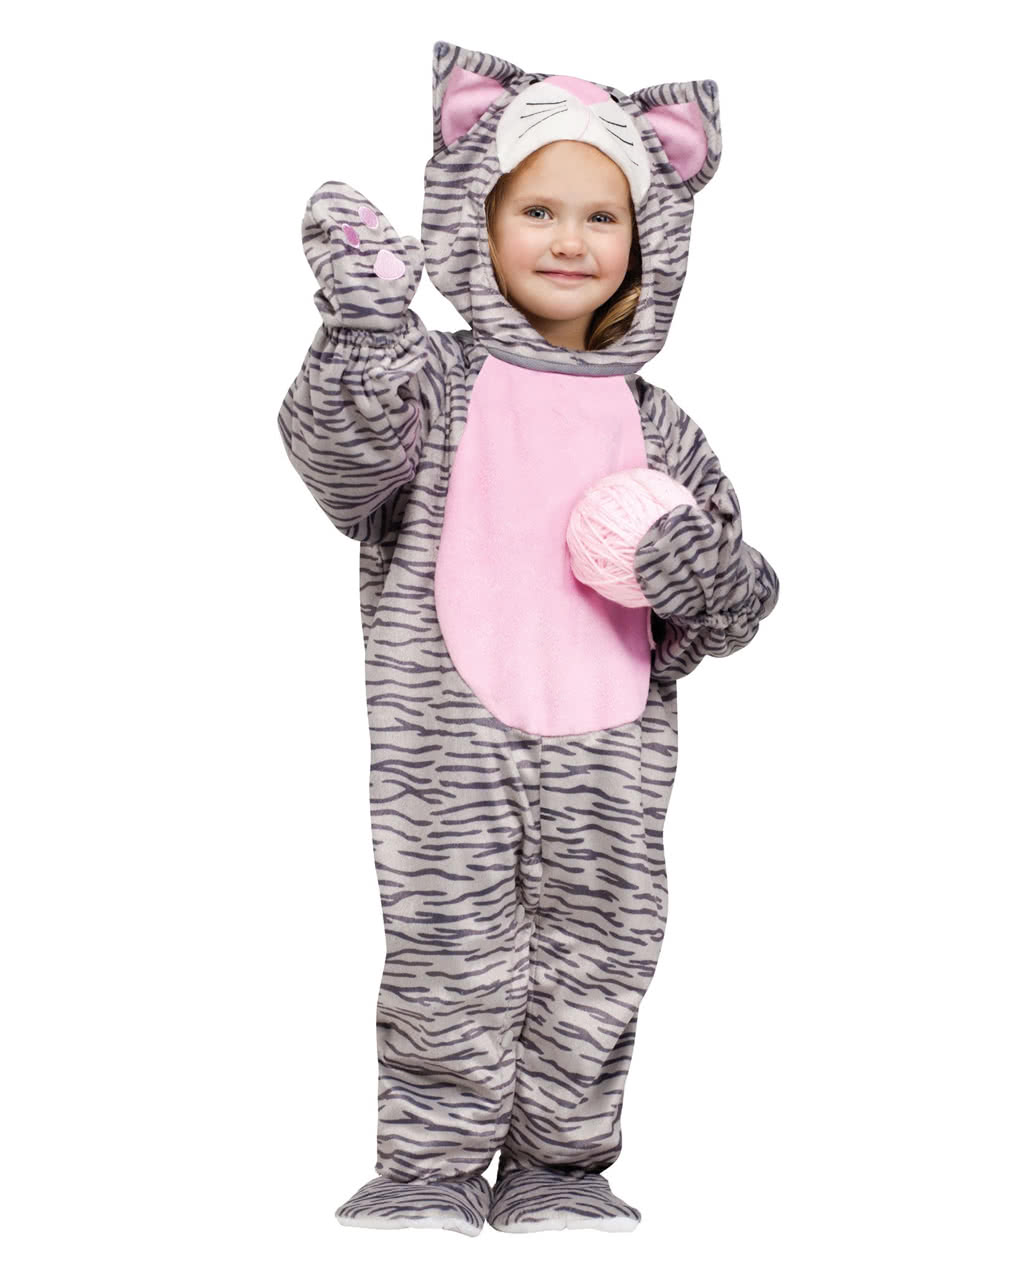 Halloween Kinderkostüme - Gruselkostüme für Kinder! | Horror-Shop.com